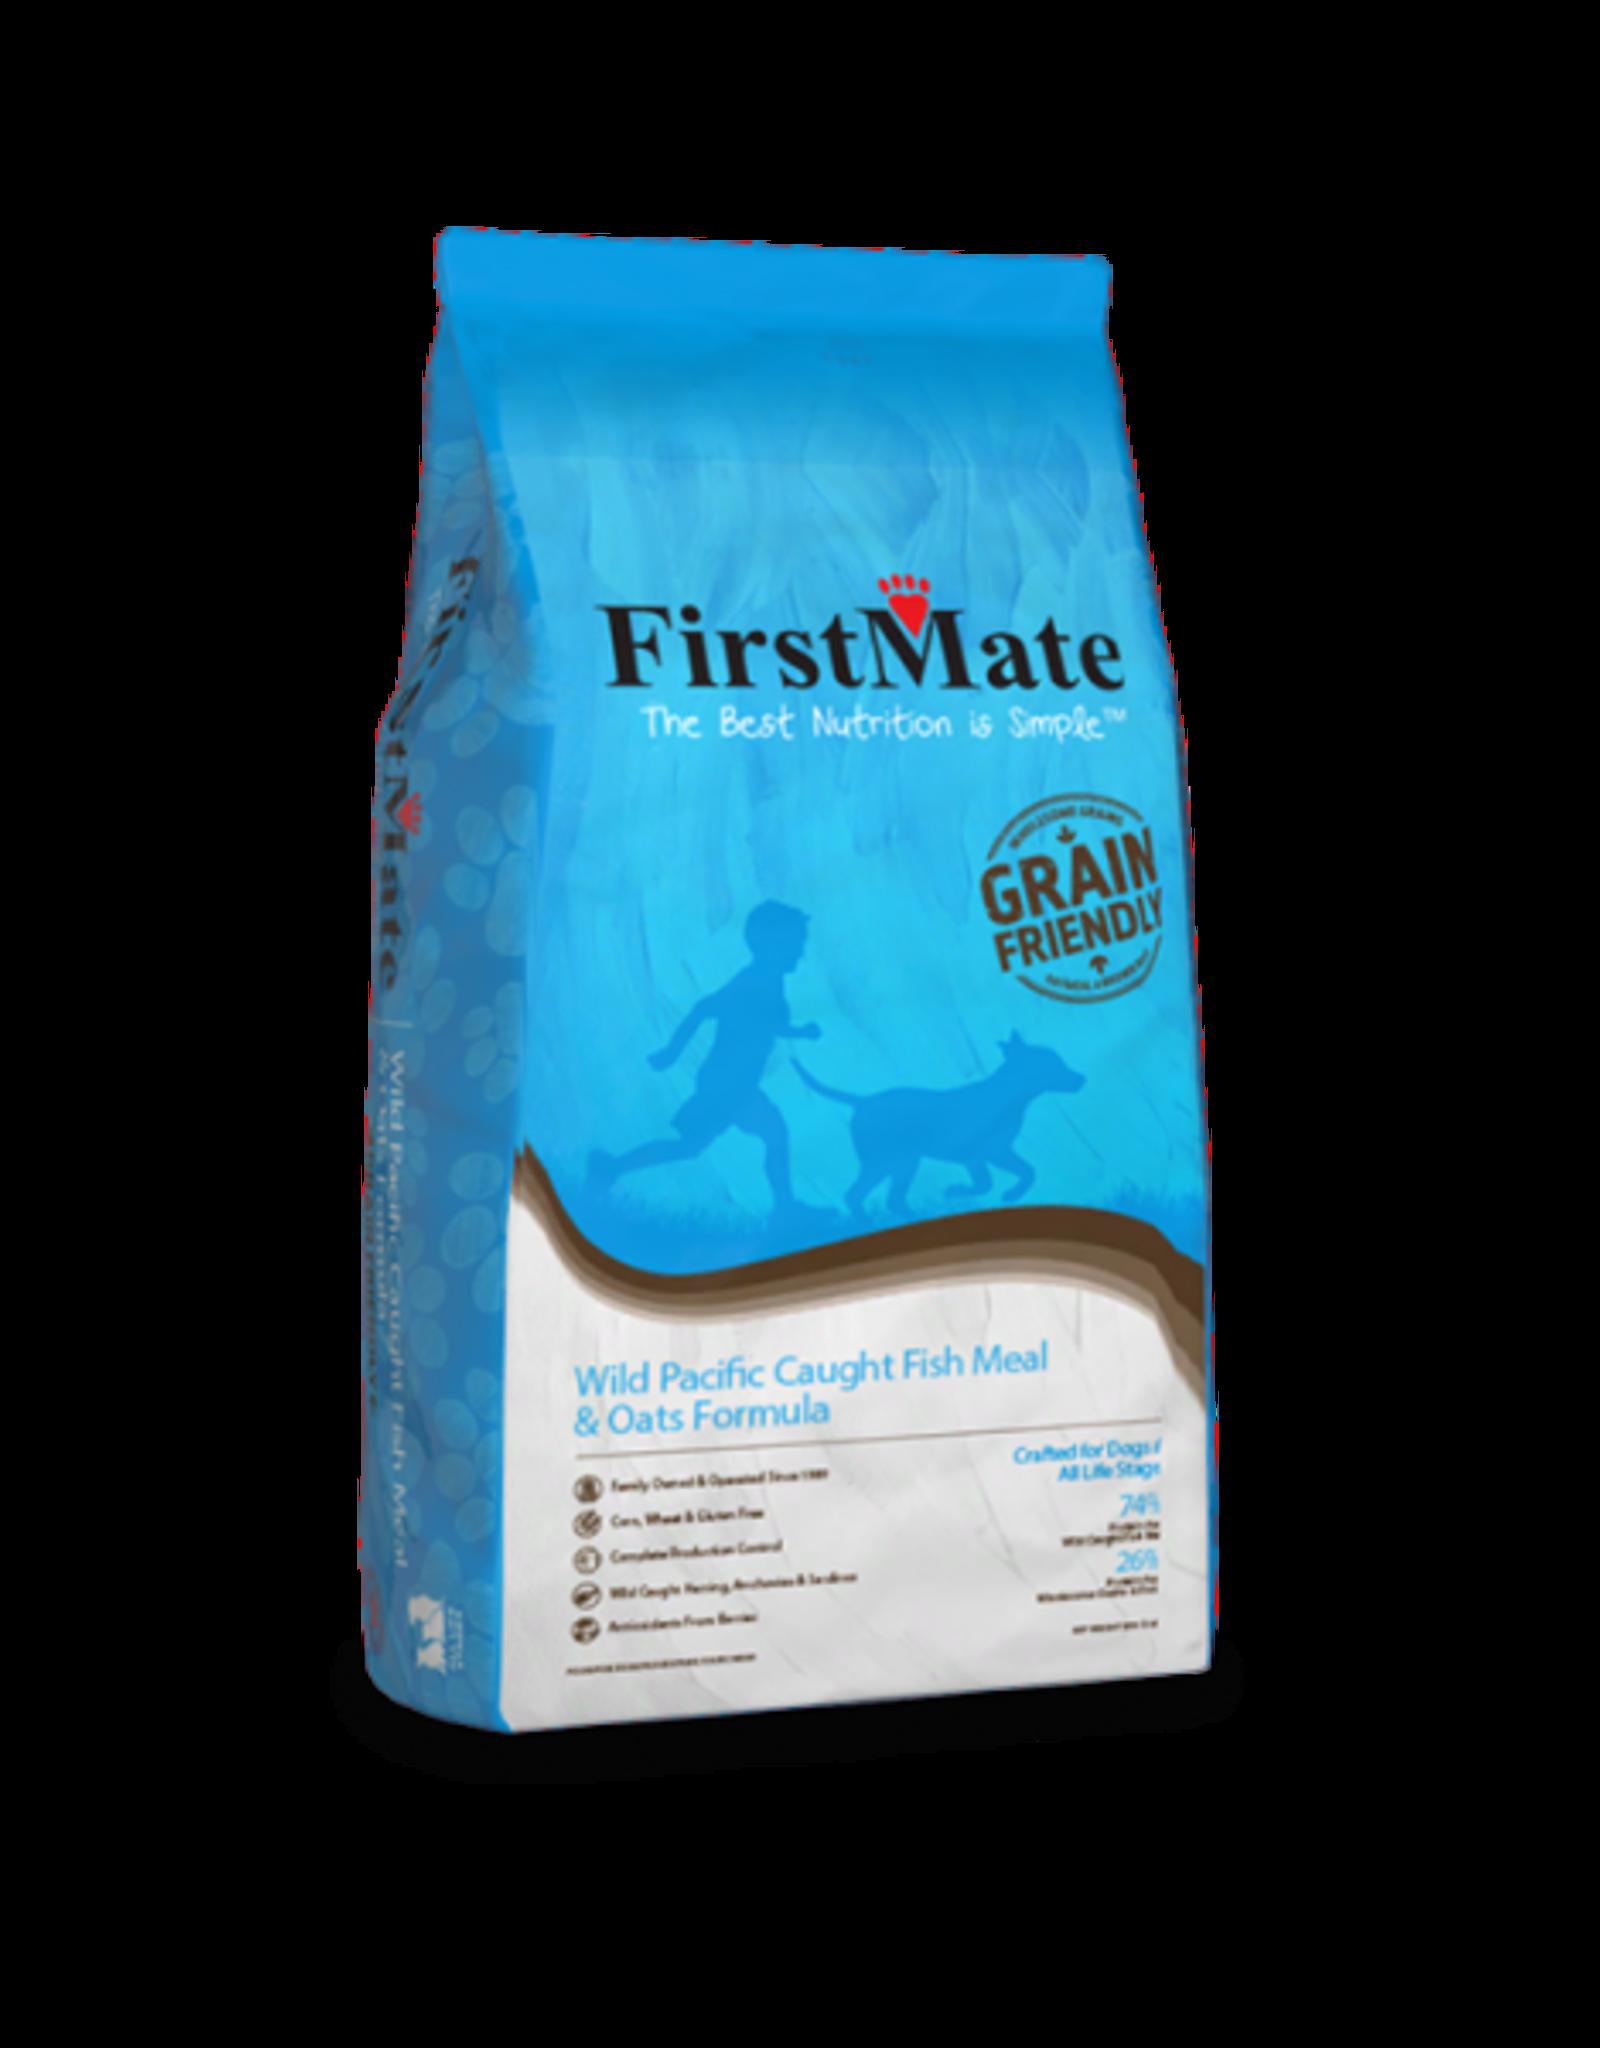 FirstMate Pet Food Dog Fish & Oats - Whole Grain 5lb